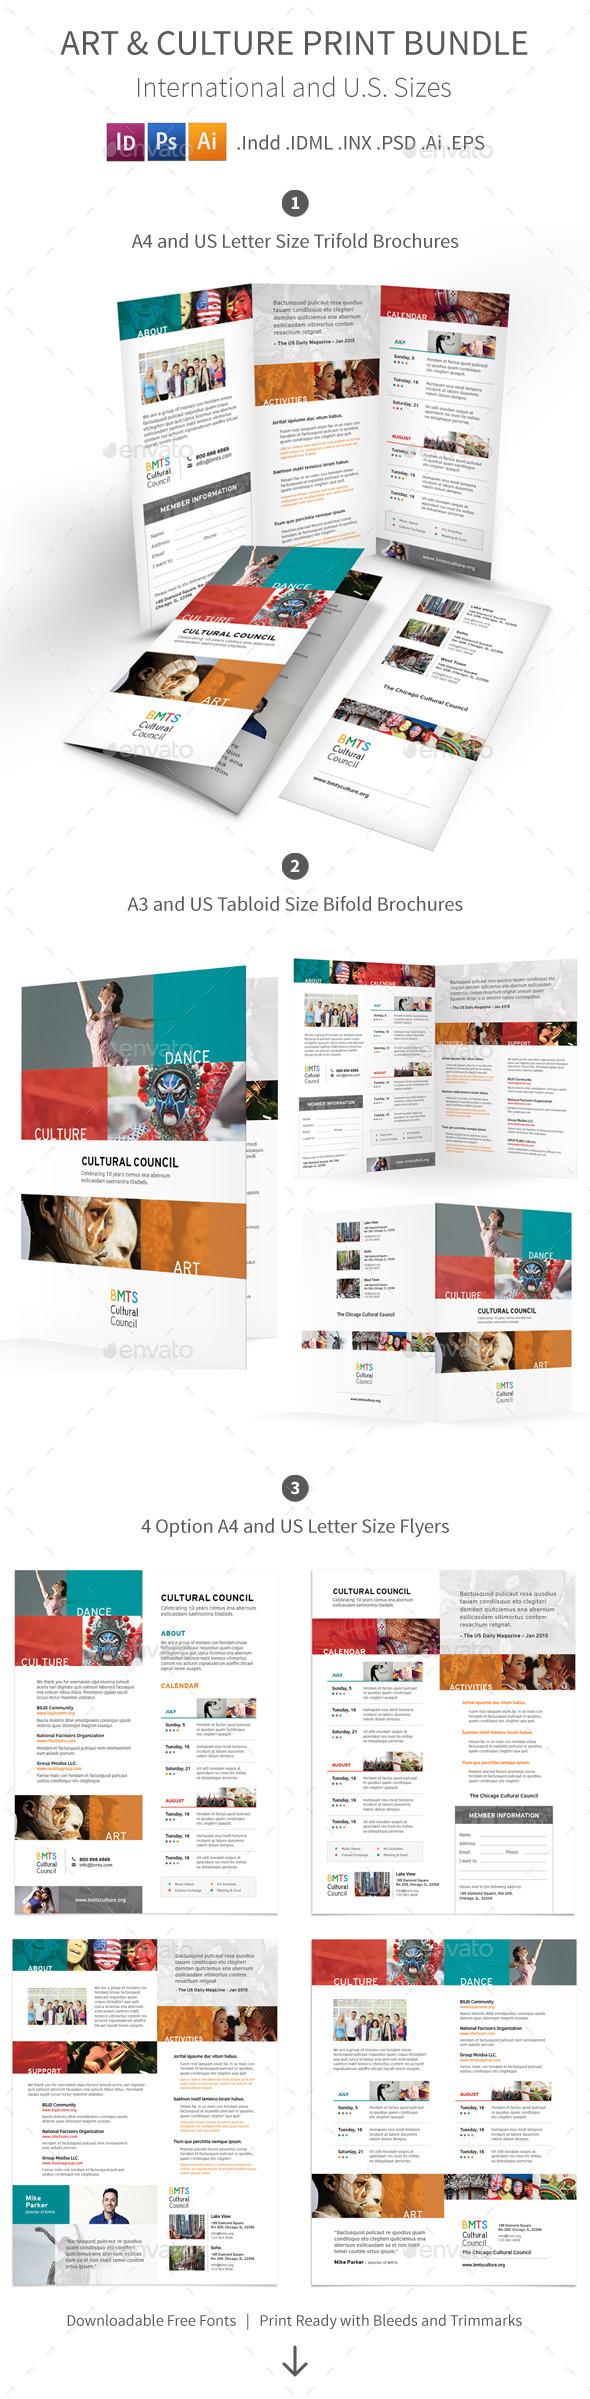 Art and Culture Print Bundle - Informational Brochures